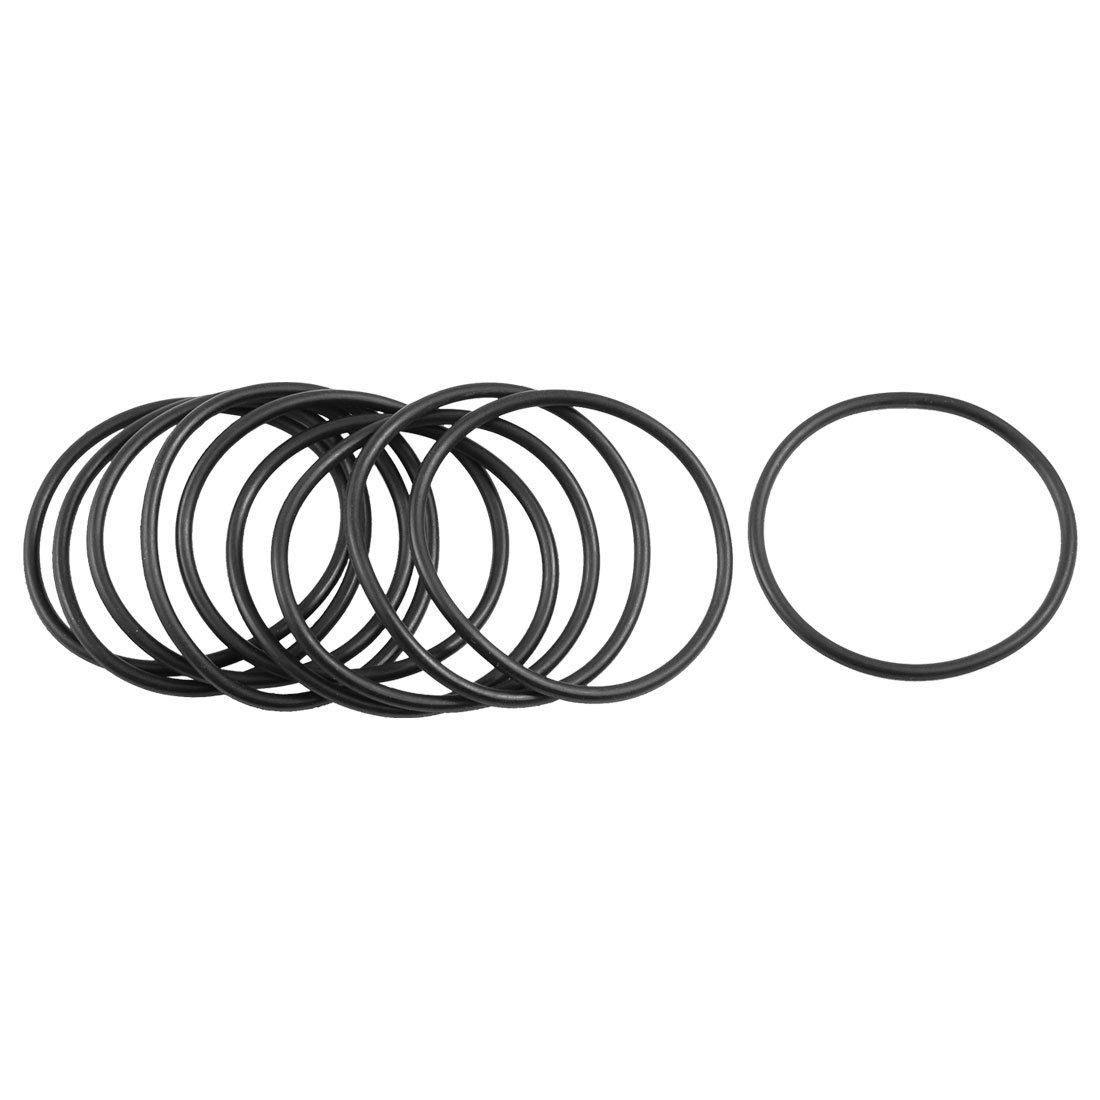 50x 7 x 1 mm Nitrile 90 o/'ring